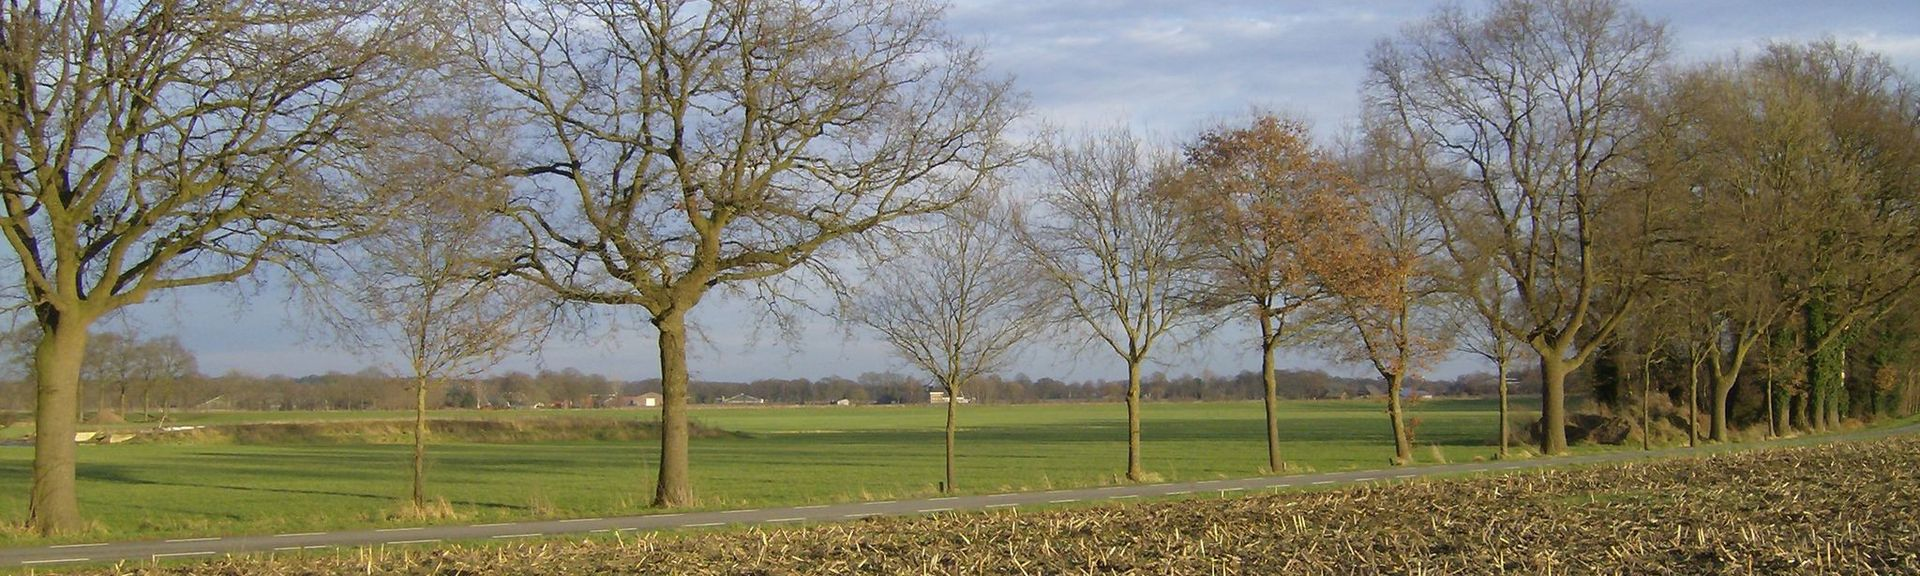 Groenlo, Gelderland, Niederlande